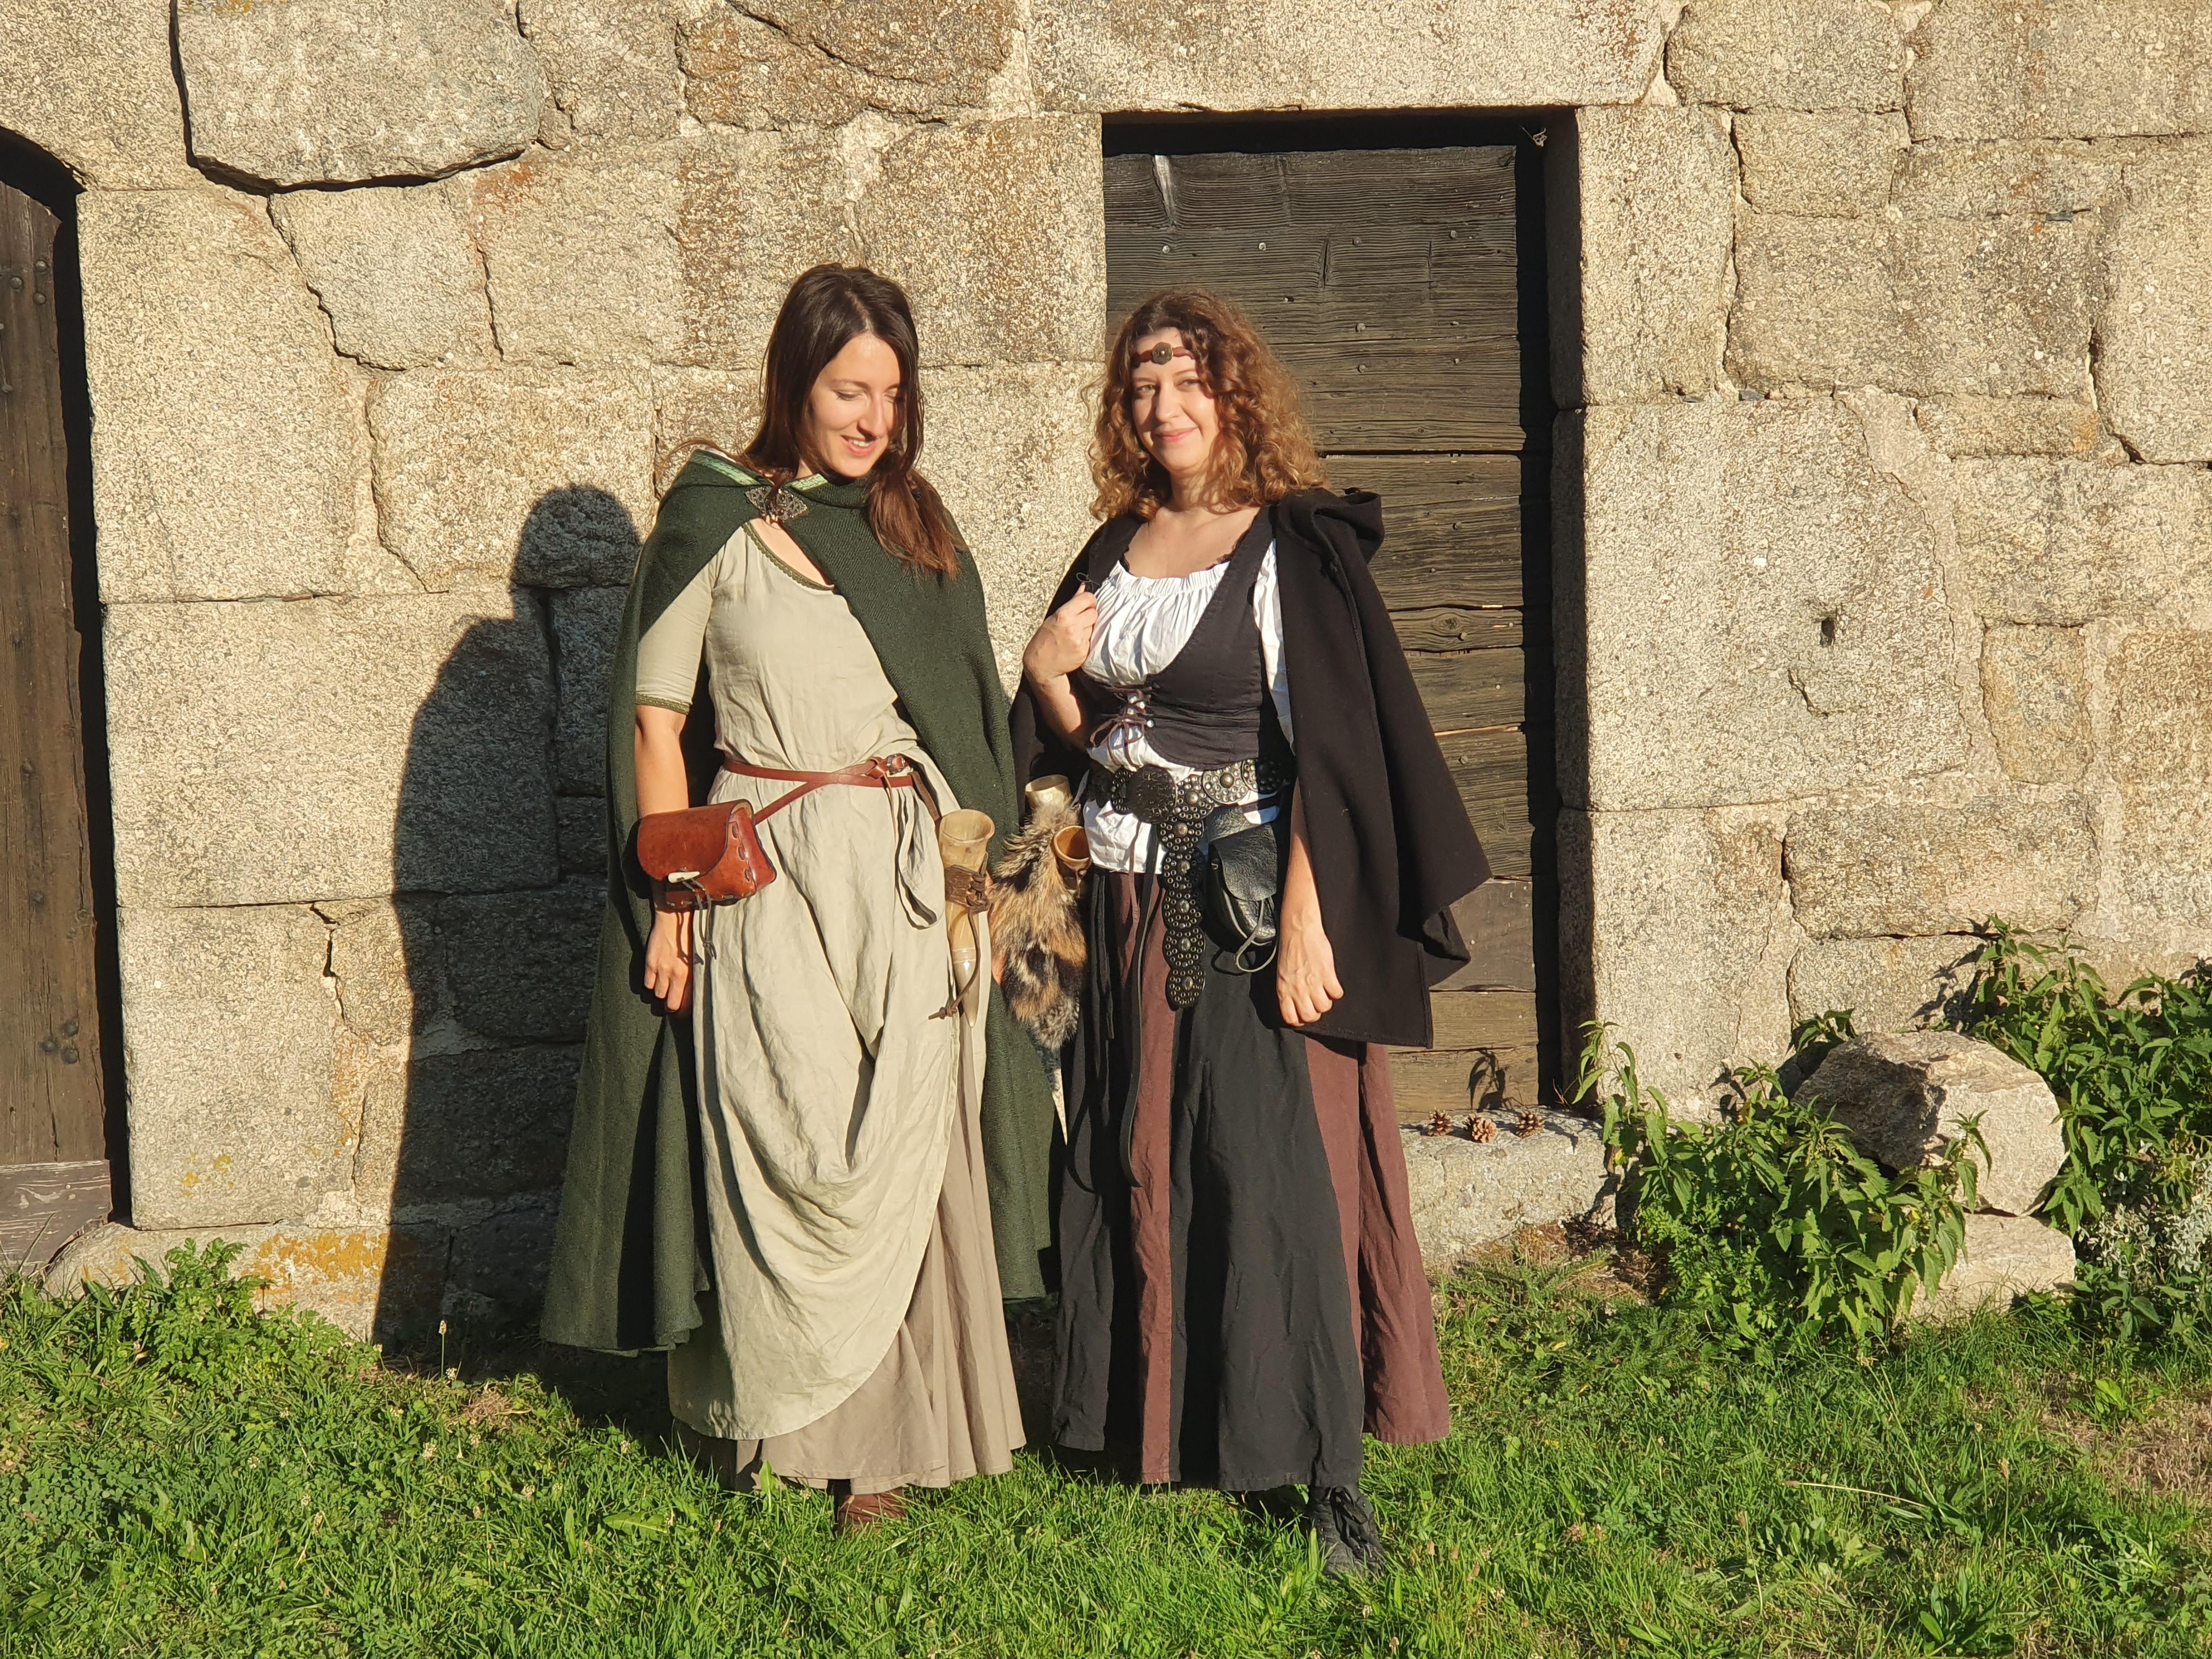 Fête mediévale au Puy en Velay